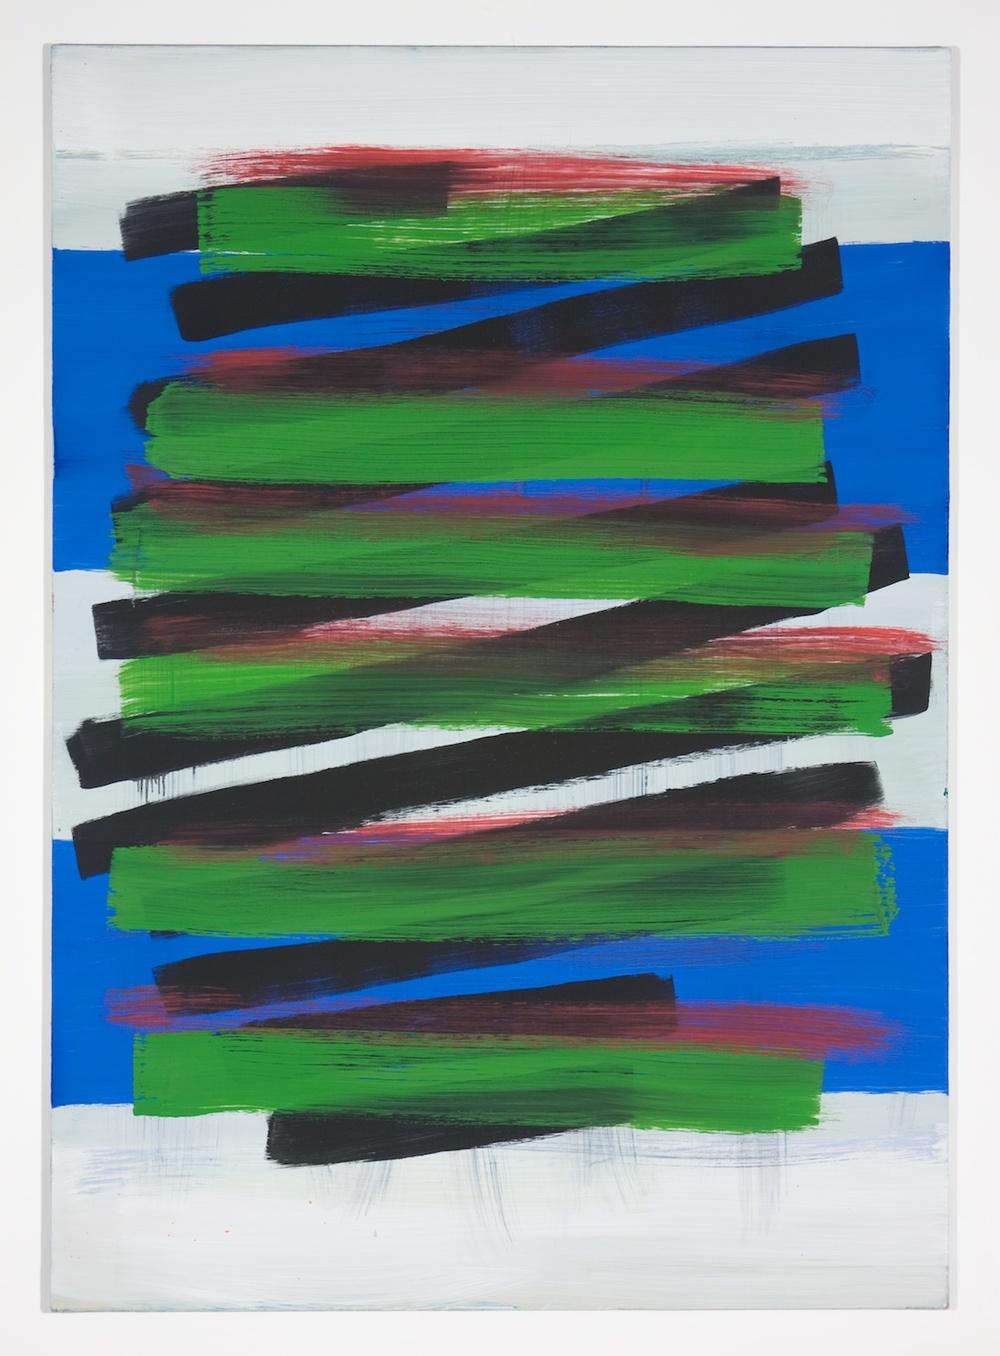 Jon Pestoni  Untitled  2012 Oil on canvas on panel 45h x 32w in JP039